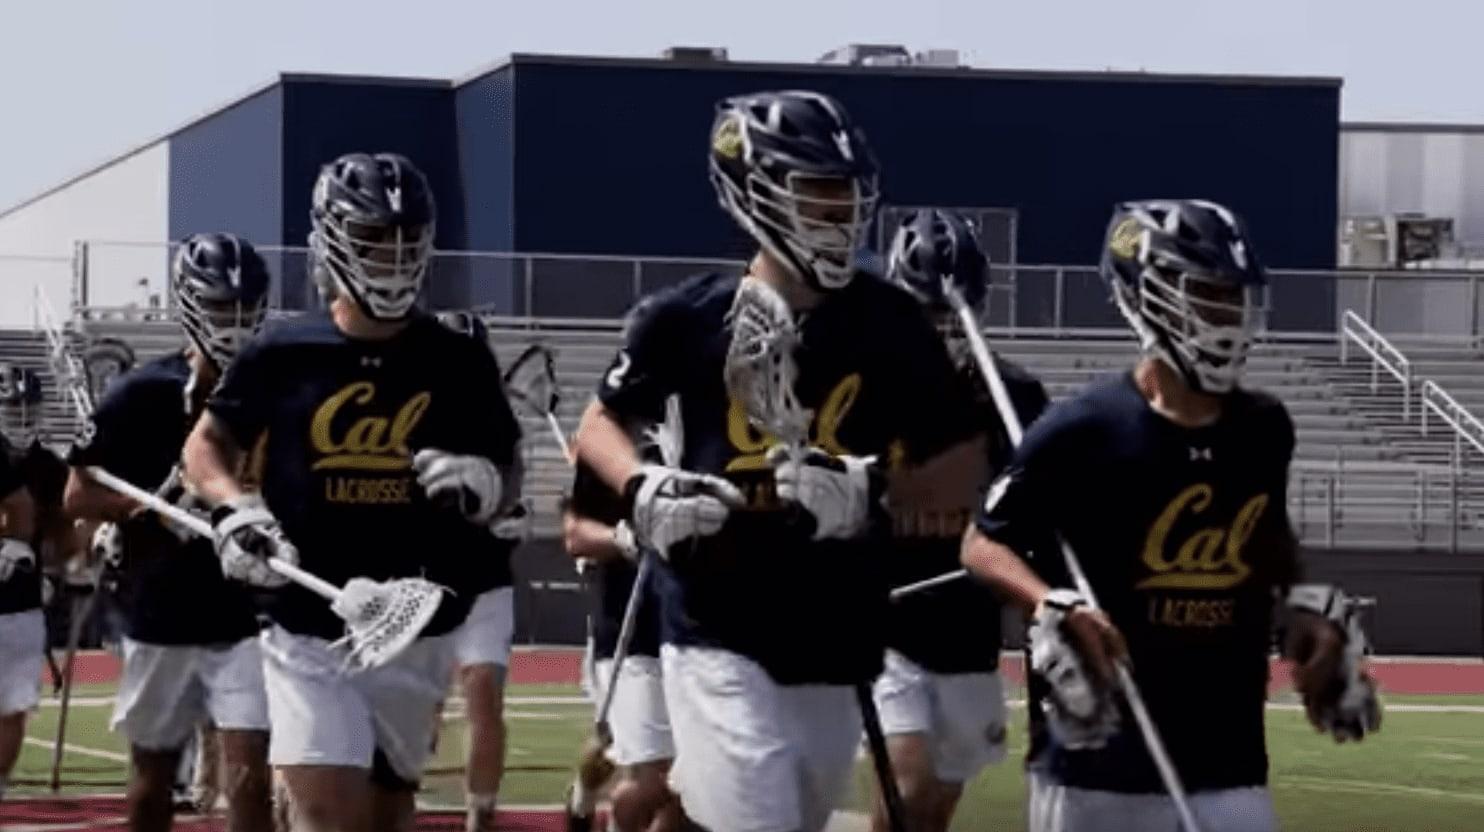 cal lacrosse santa clara lacrosse mcla 2019